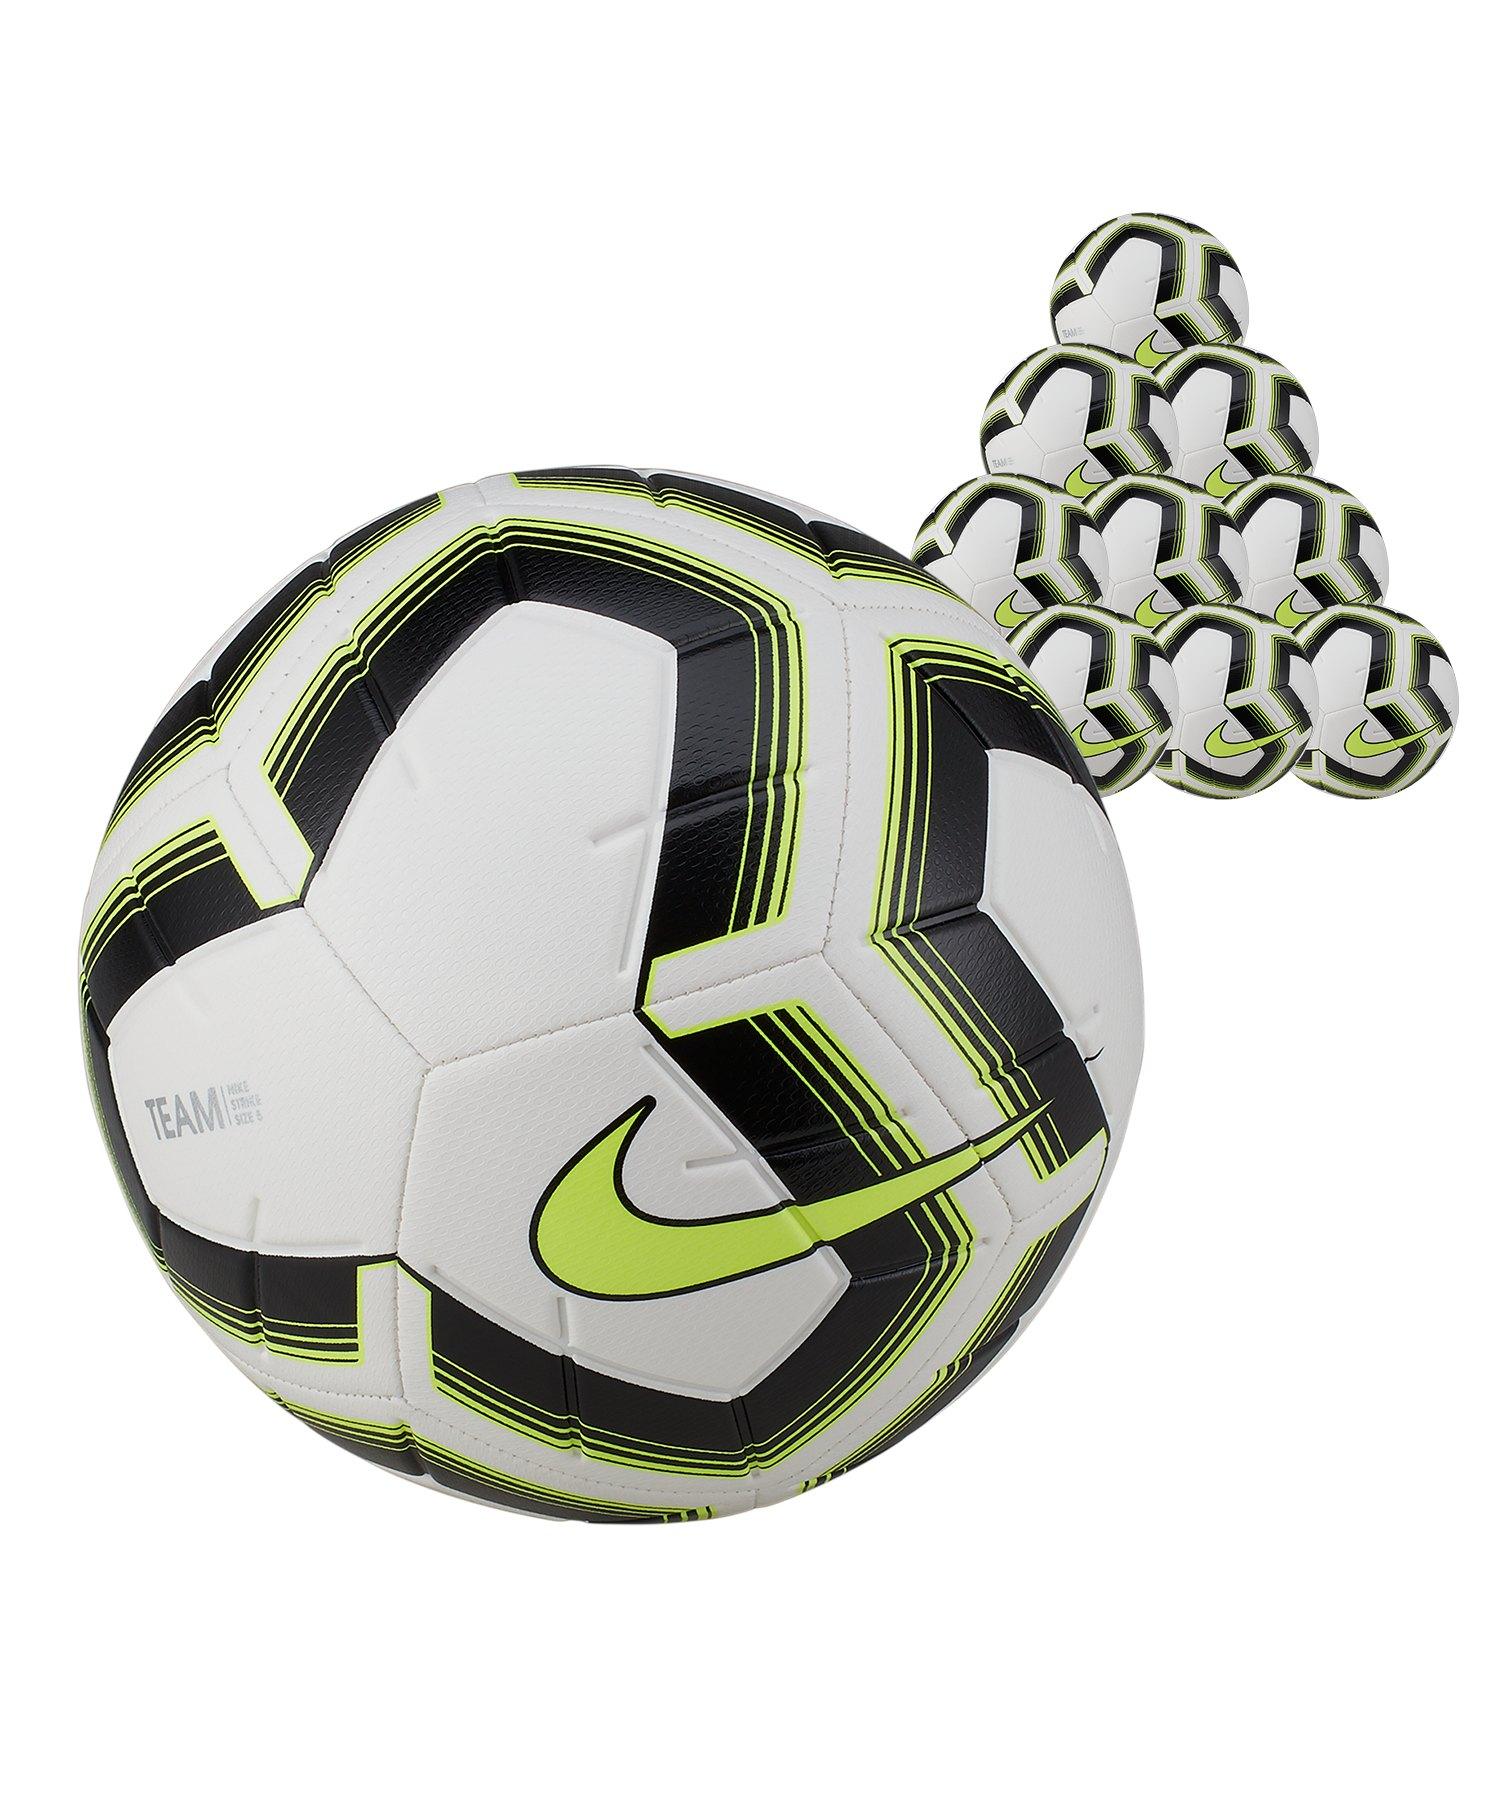 Nike Strike Team 10x Trainingsball Gr.4 Weiss F102 - weiss